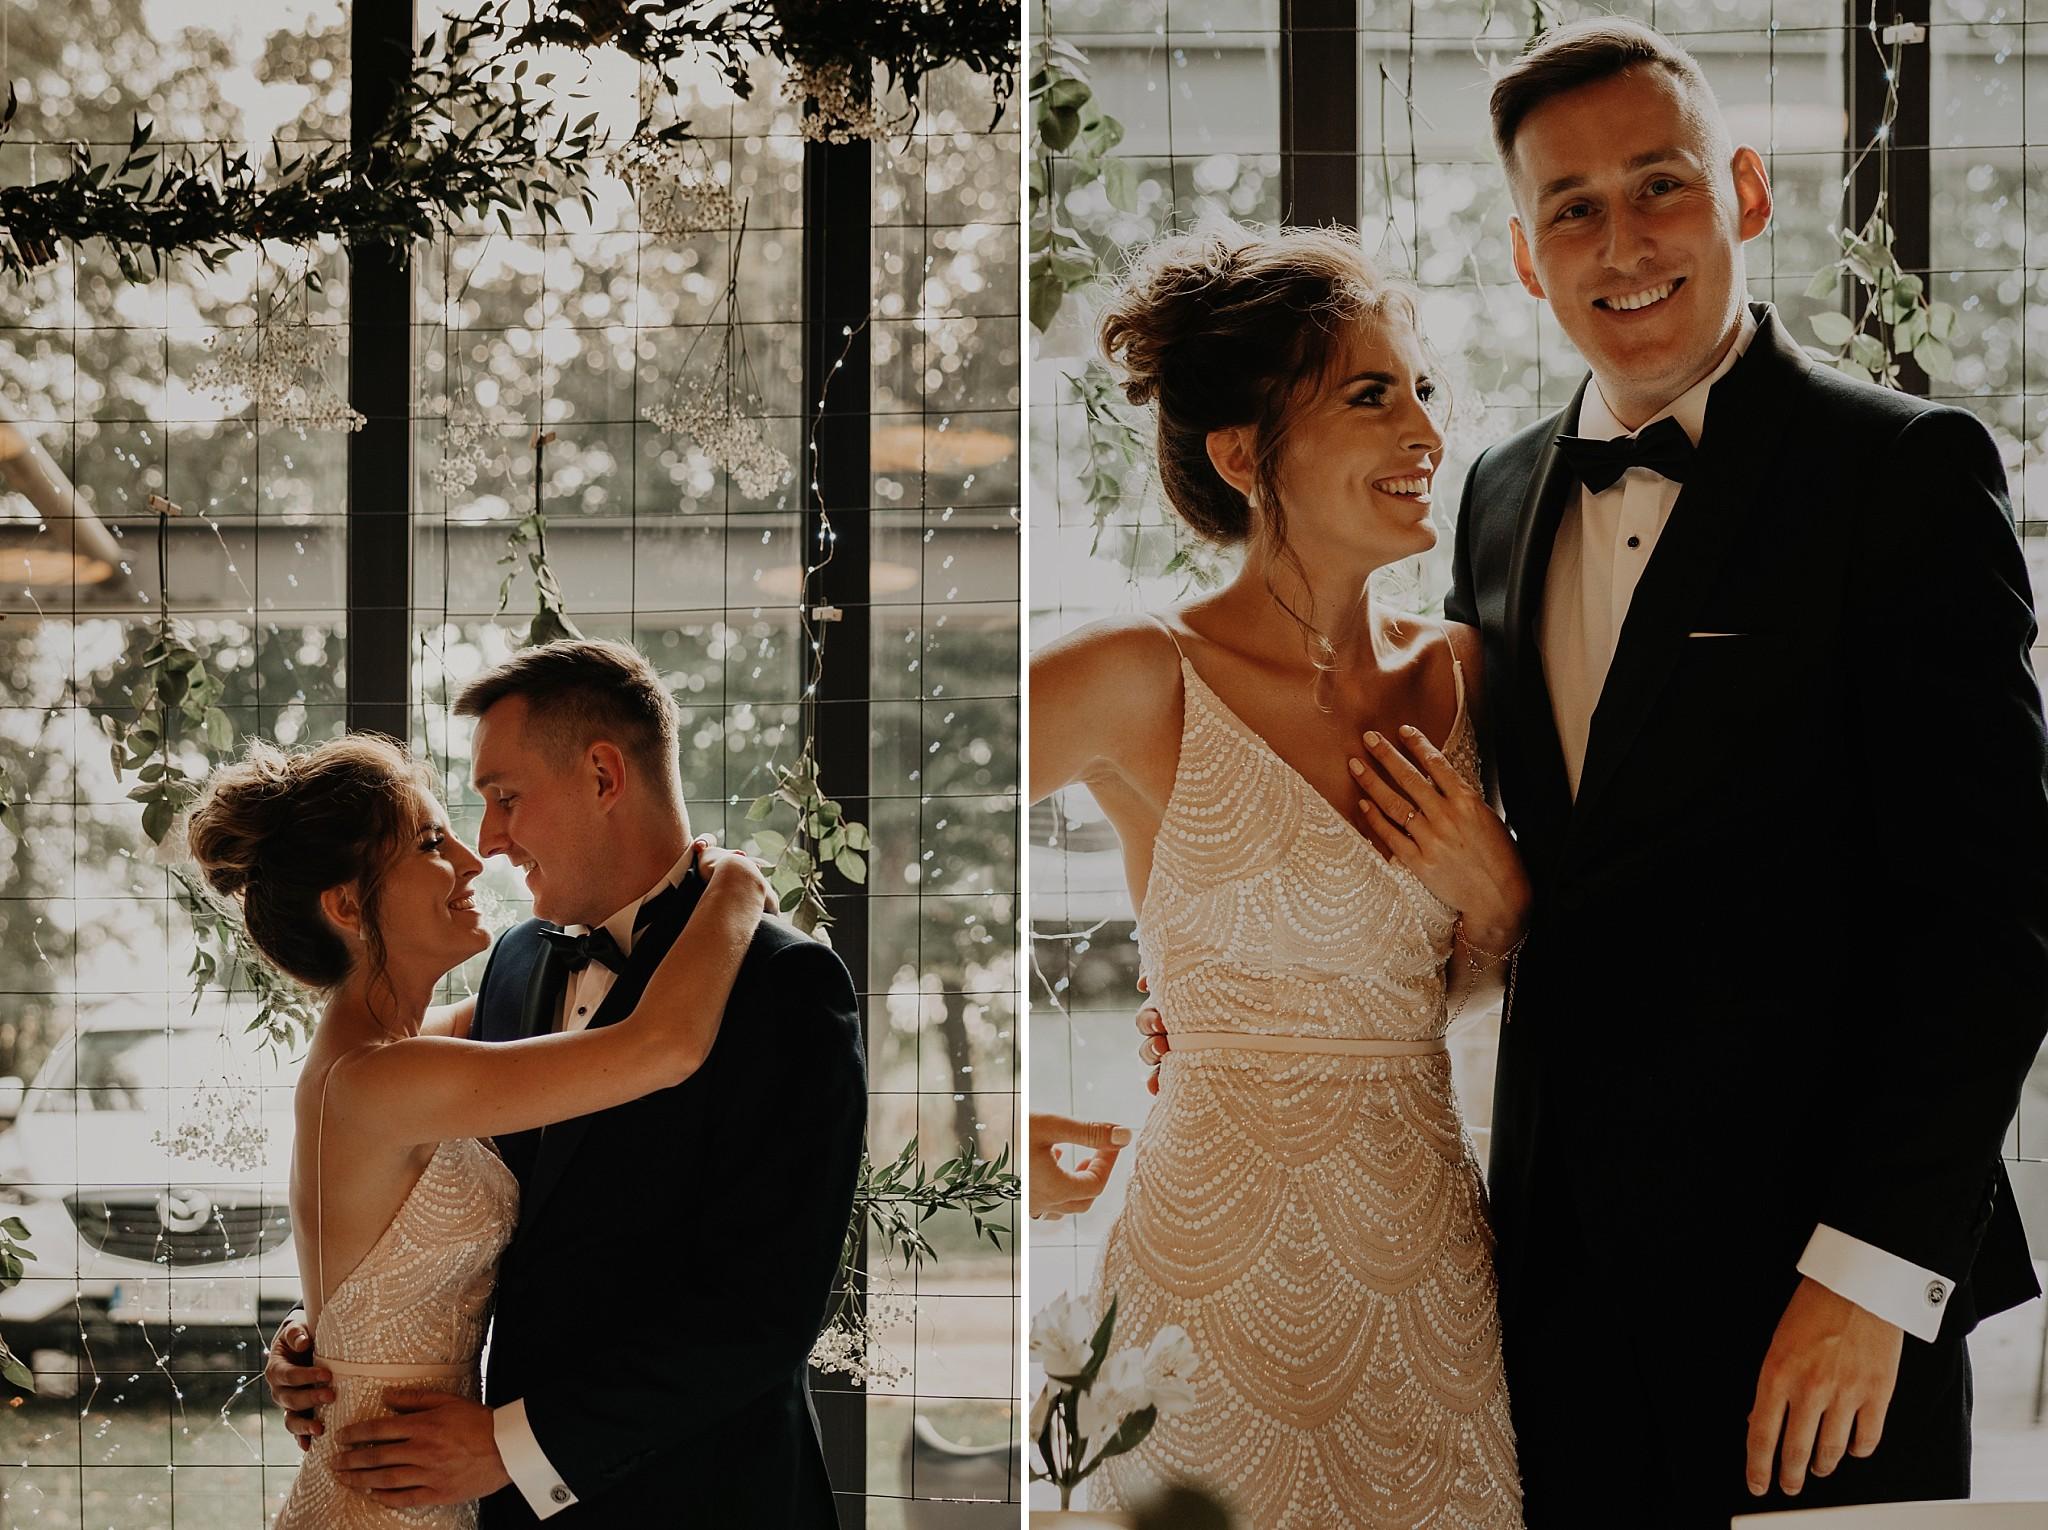 fotograf poznan wesele dobra truskawka piekne wesele pod poznaniem wesele w dobrej truskawce piekna para mloda slub marzen slub koronawirus slub listopad wesele koronawirus 303